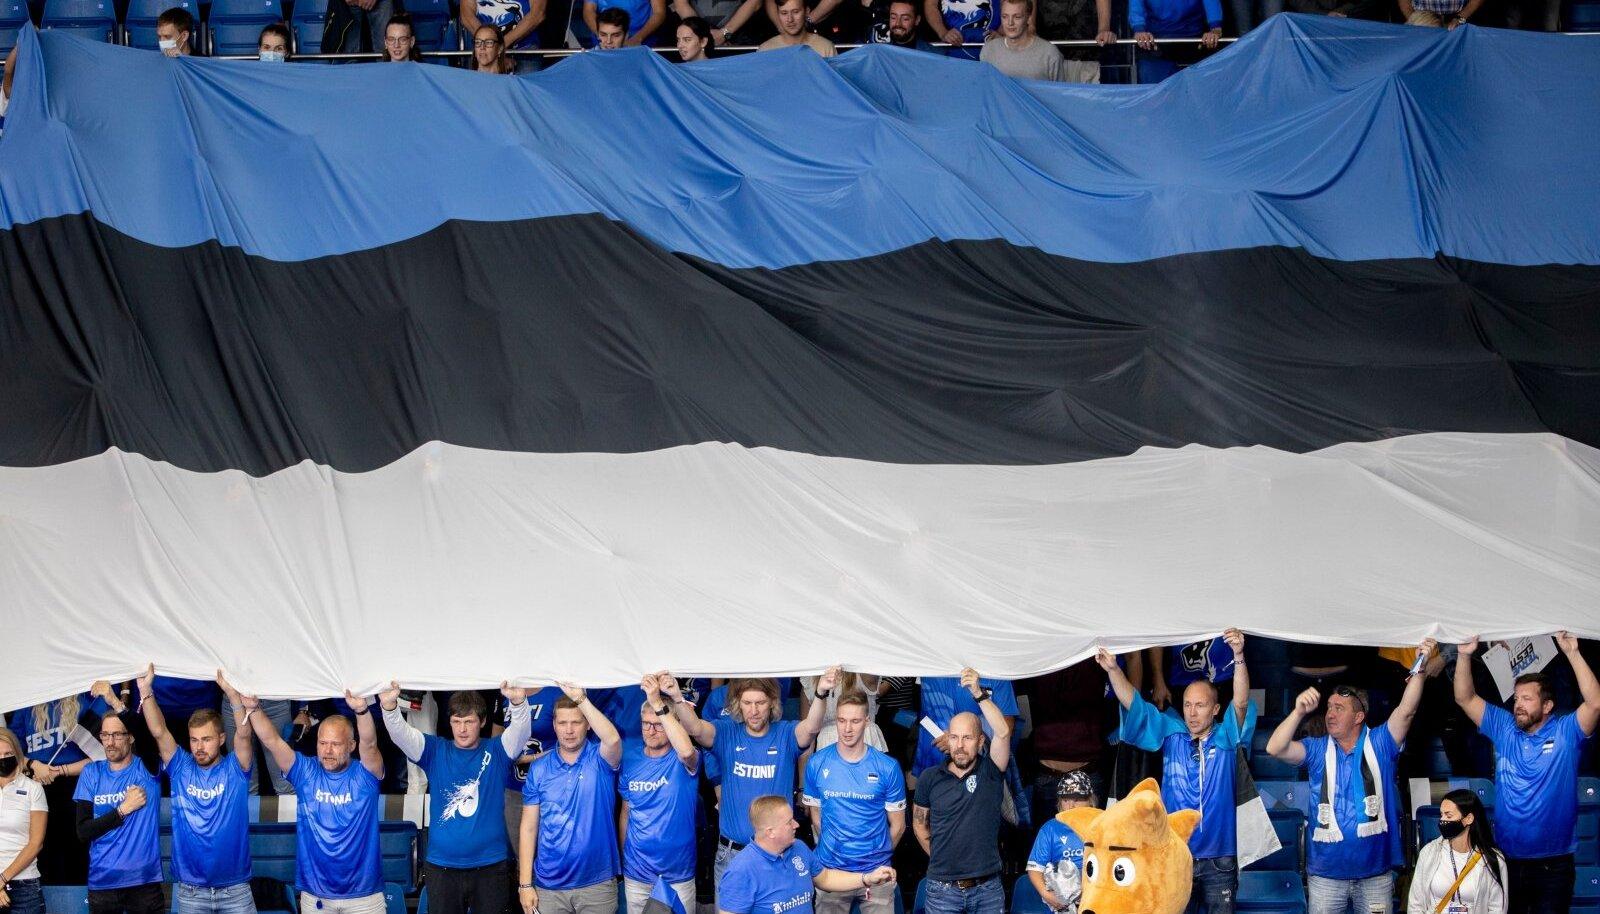 Eesti spordifännid.